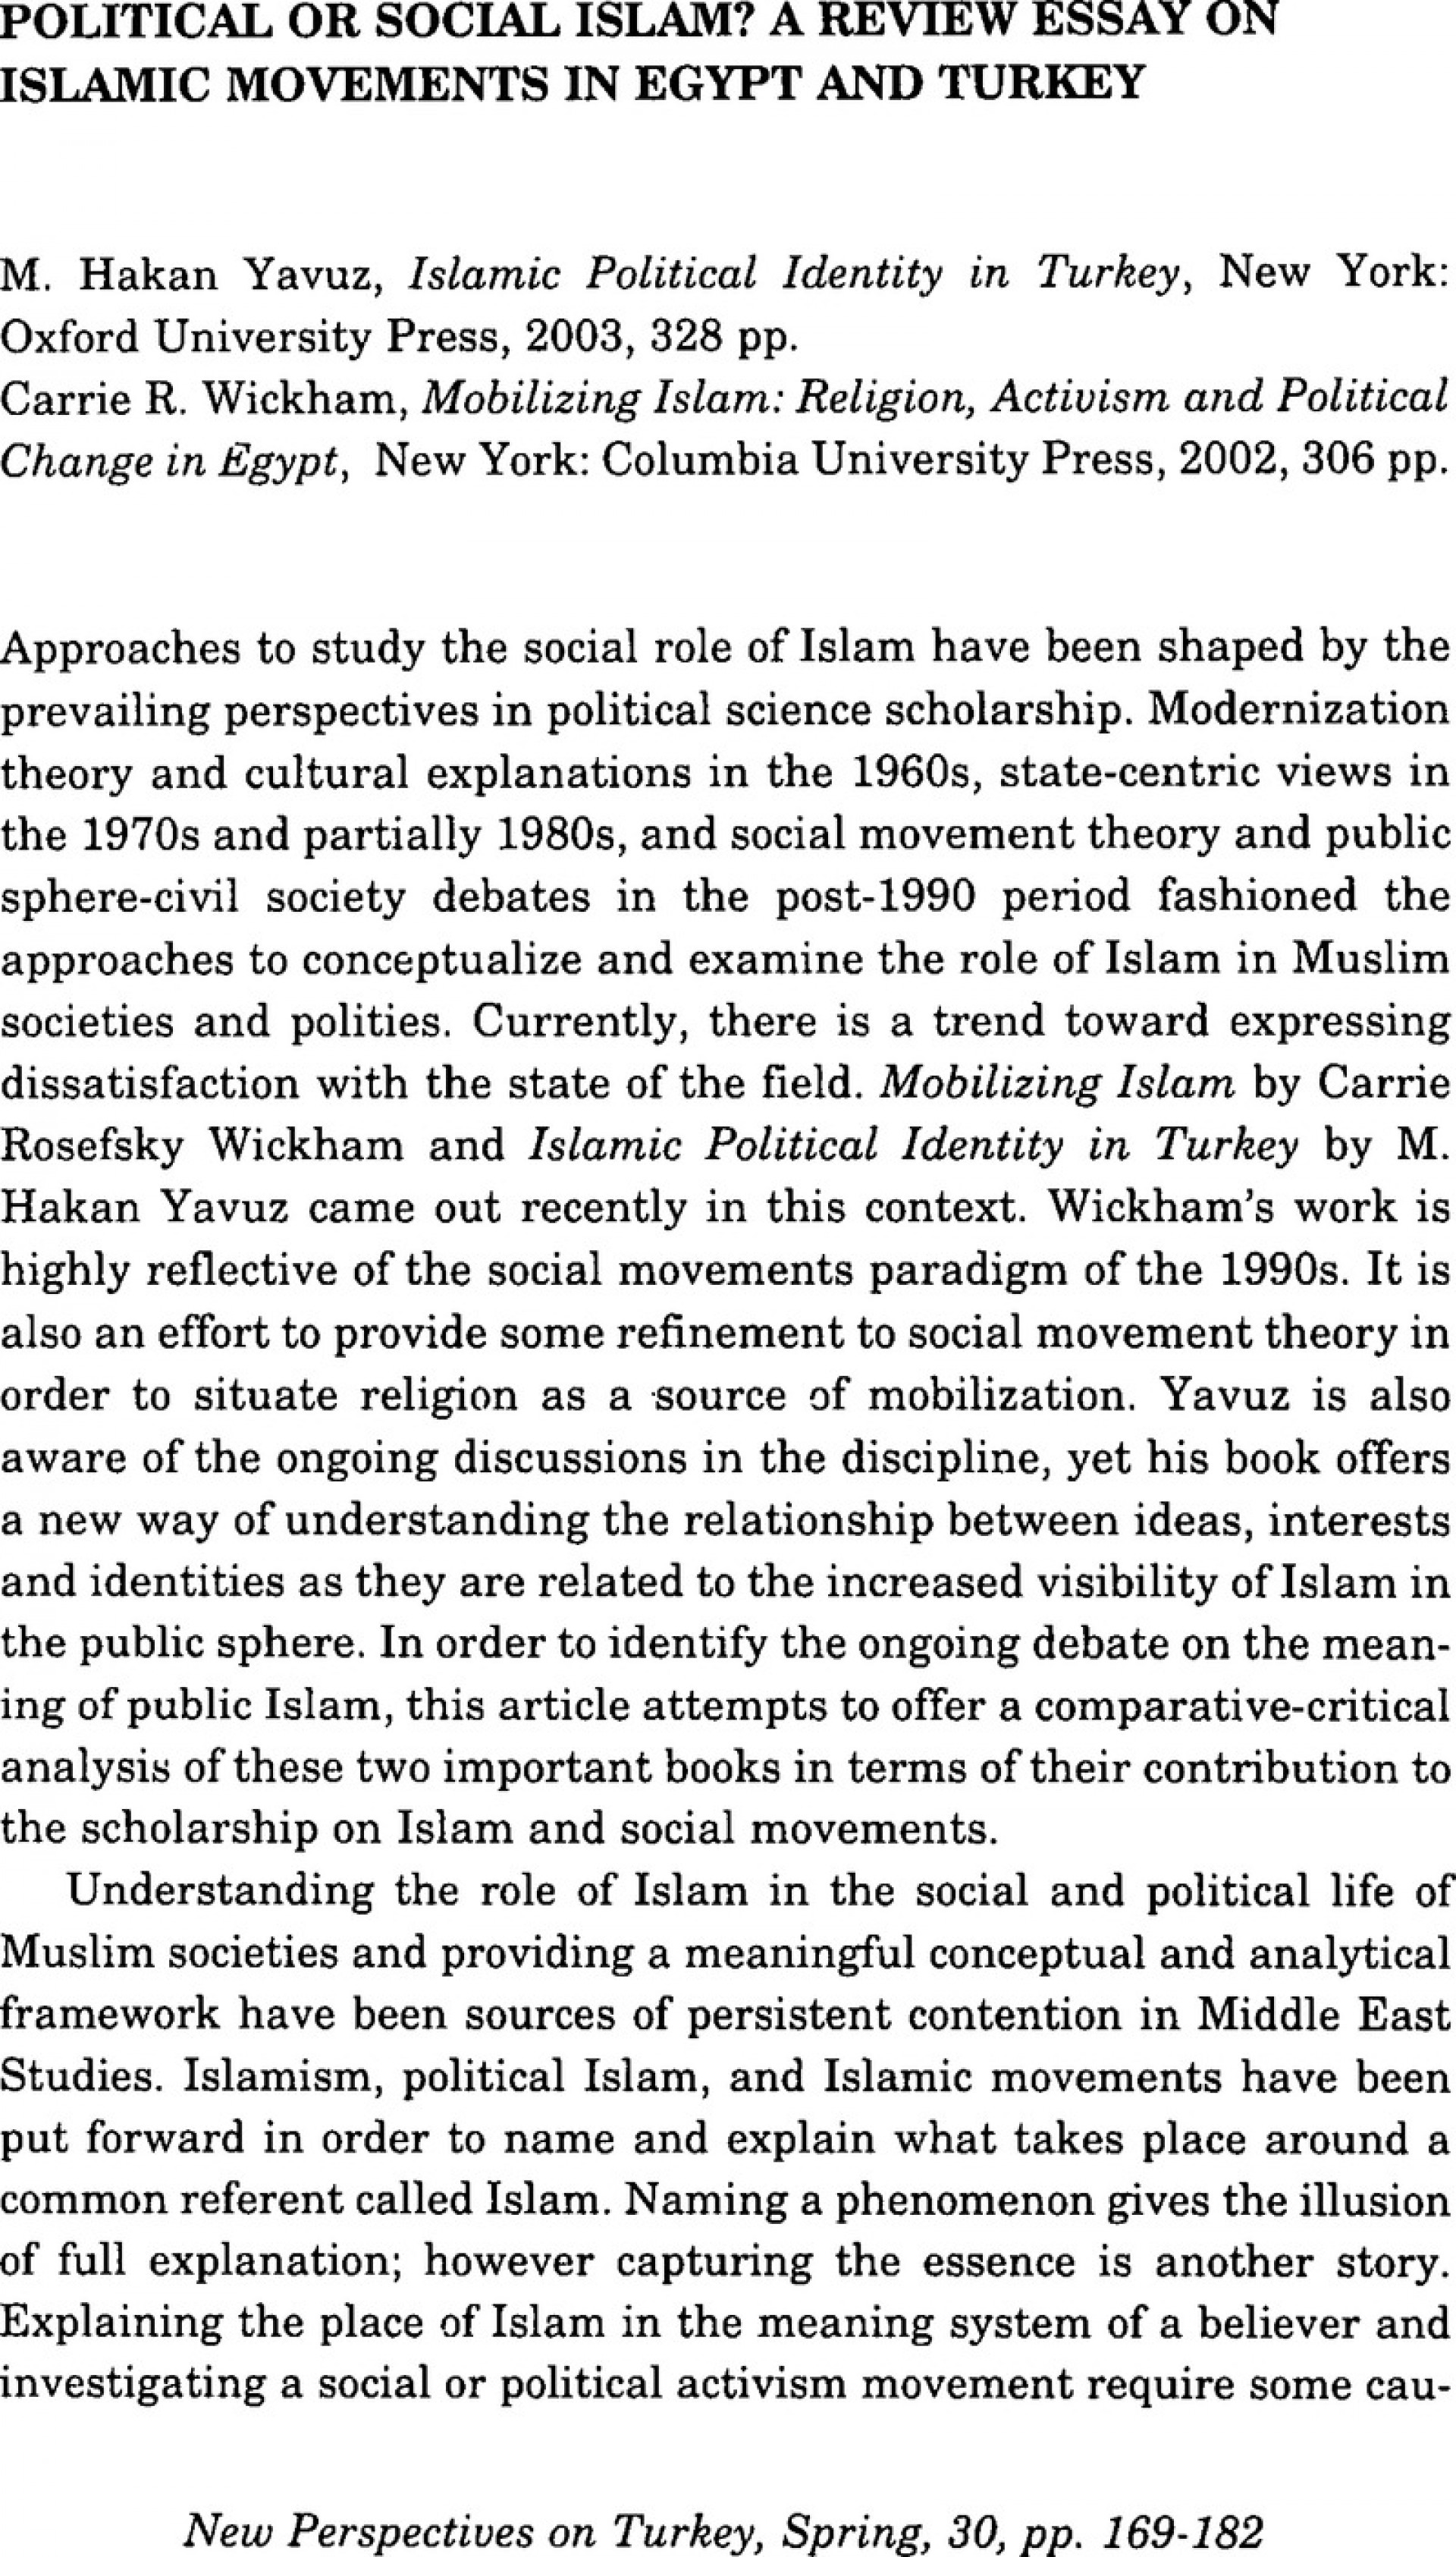 001 Essay On Islam Example Firstpage Awful Persuasive Islamophobia My City Islamabad In Urdu Religion Hindi 1920